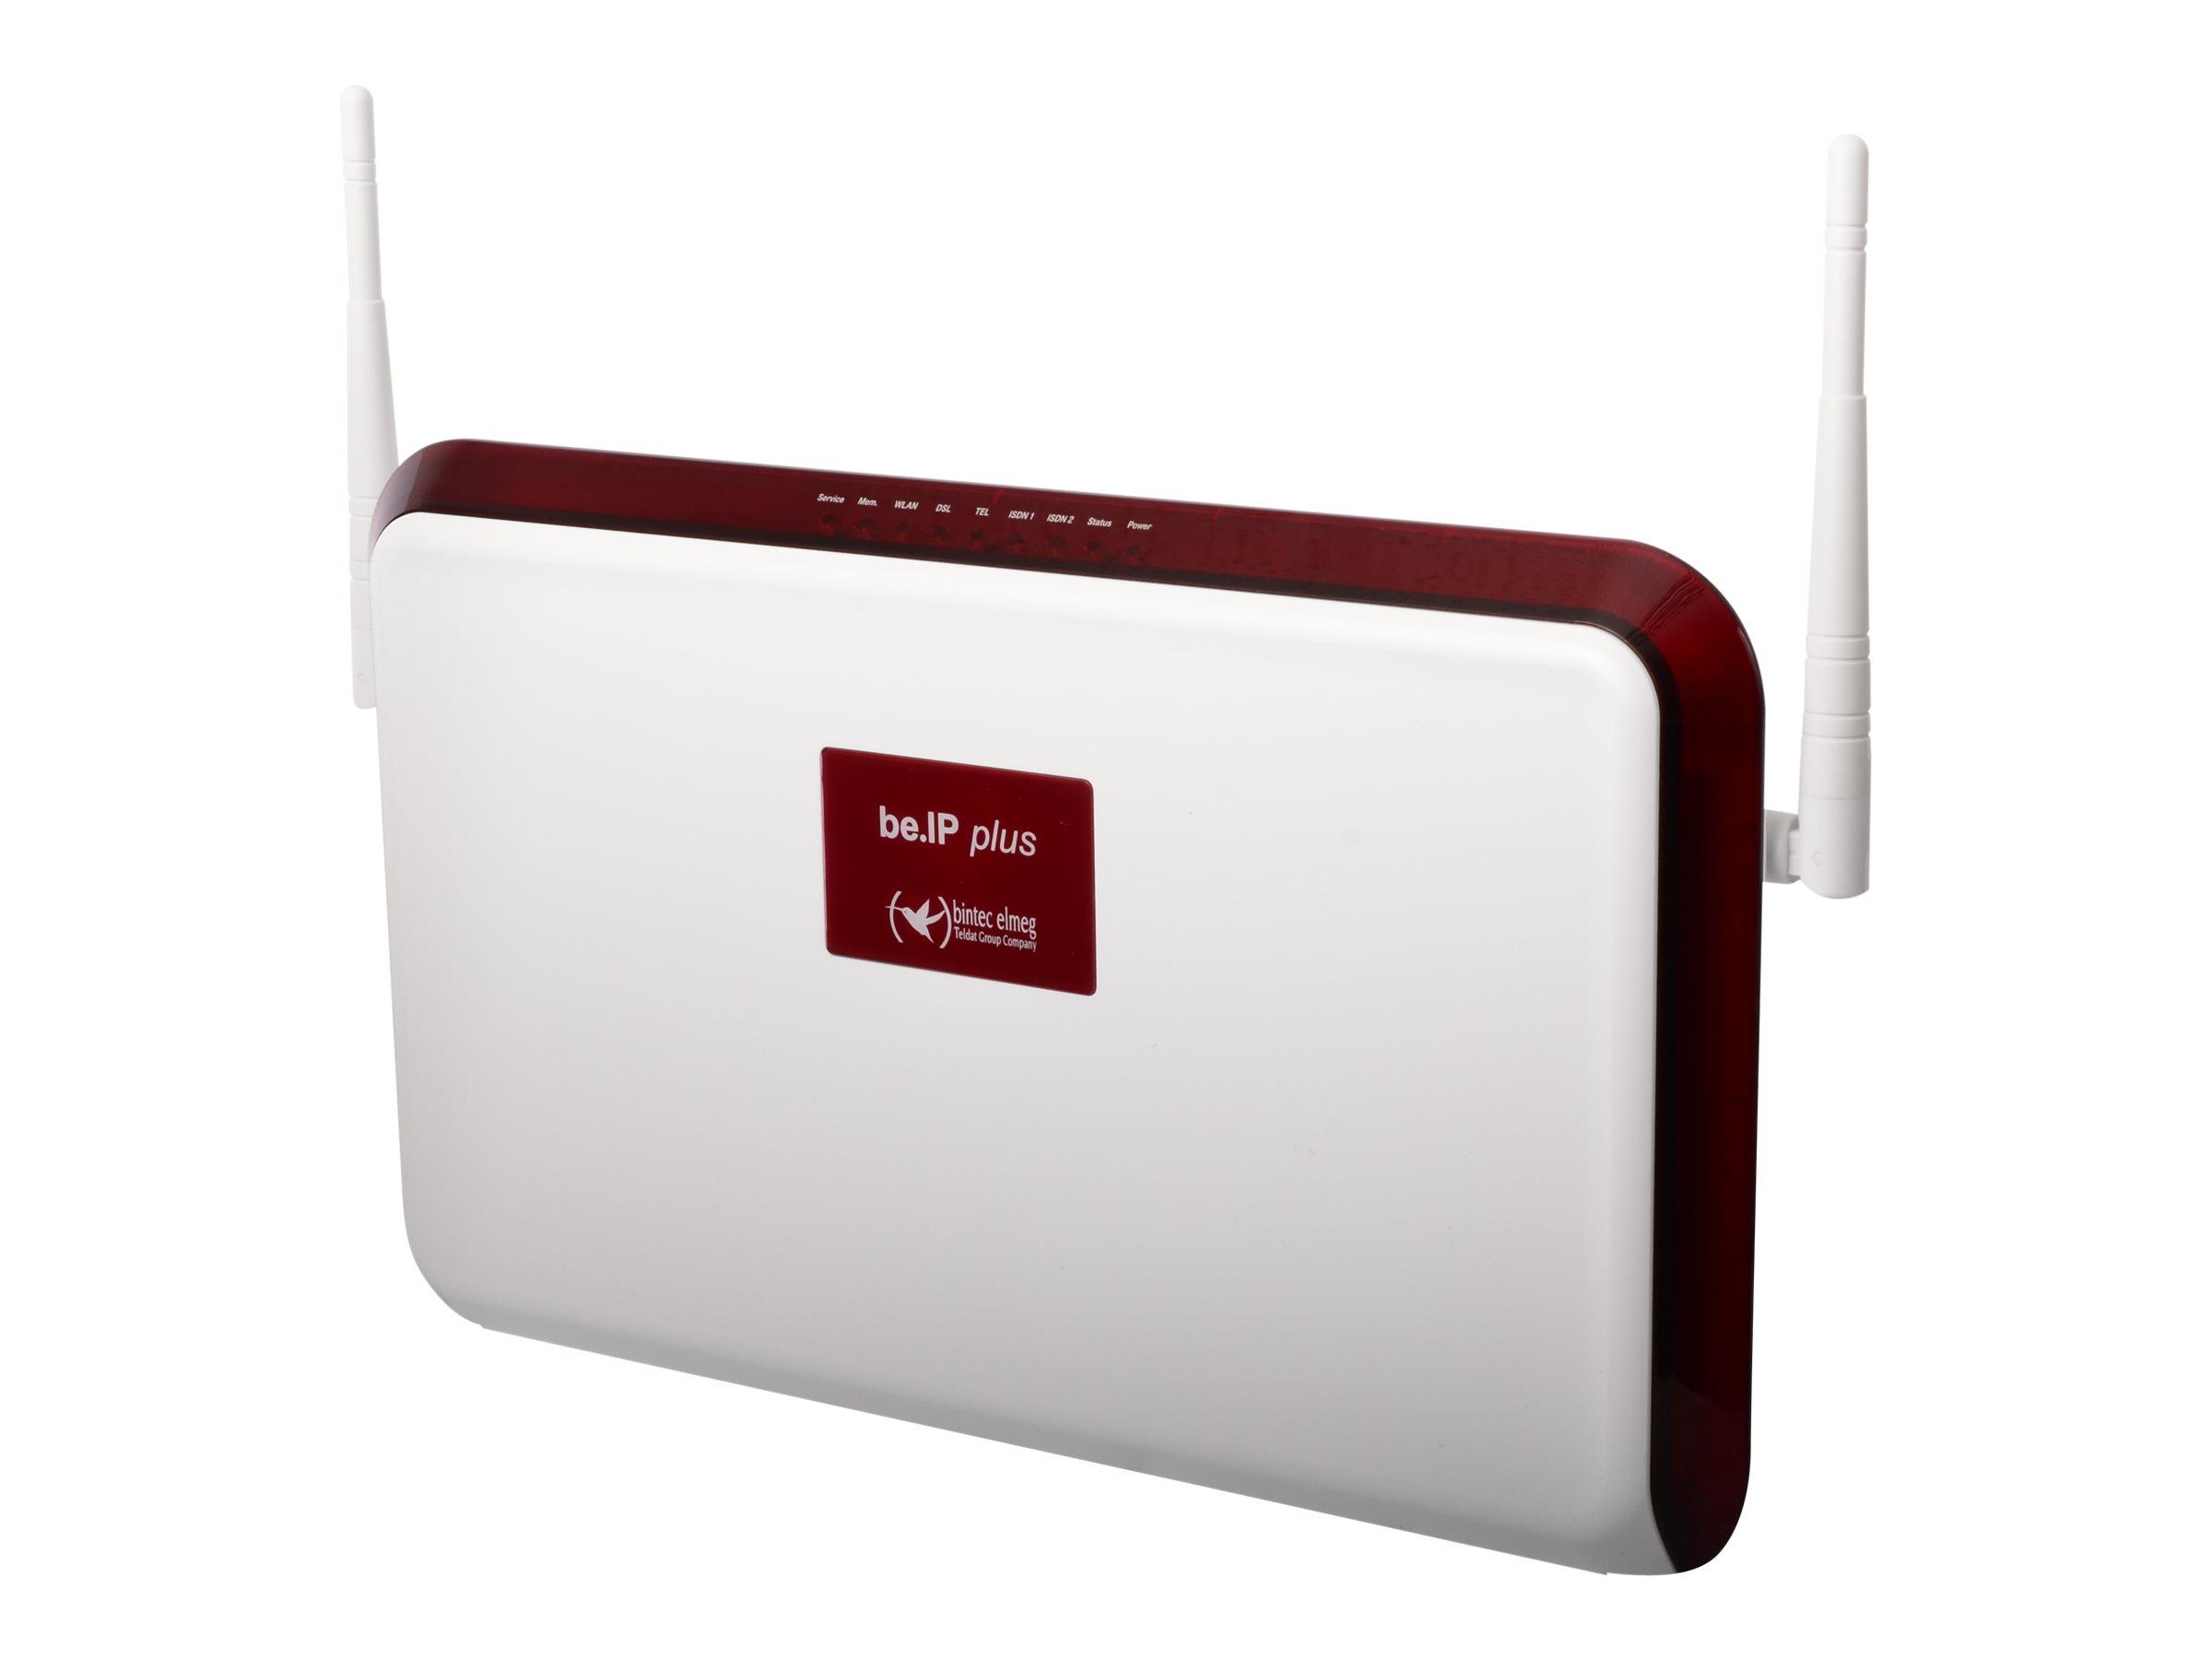 bintec elmeg be.IP plus - Wireless Router - DSL-Modem